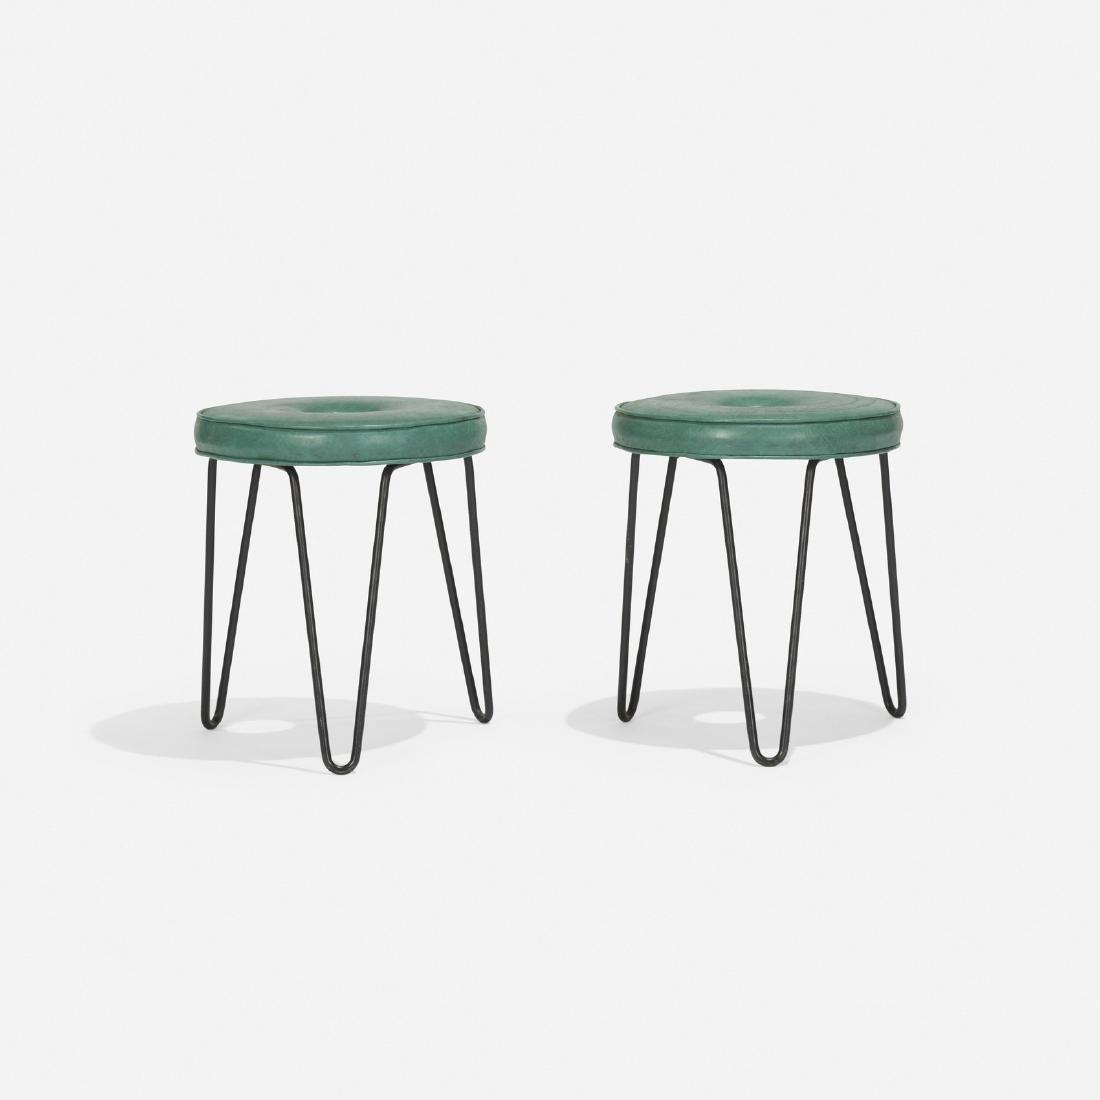 American, stools, pair